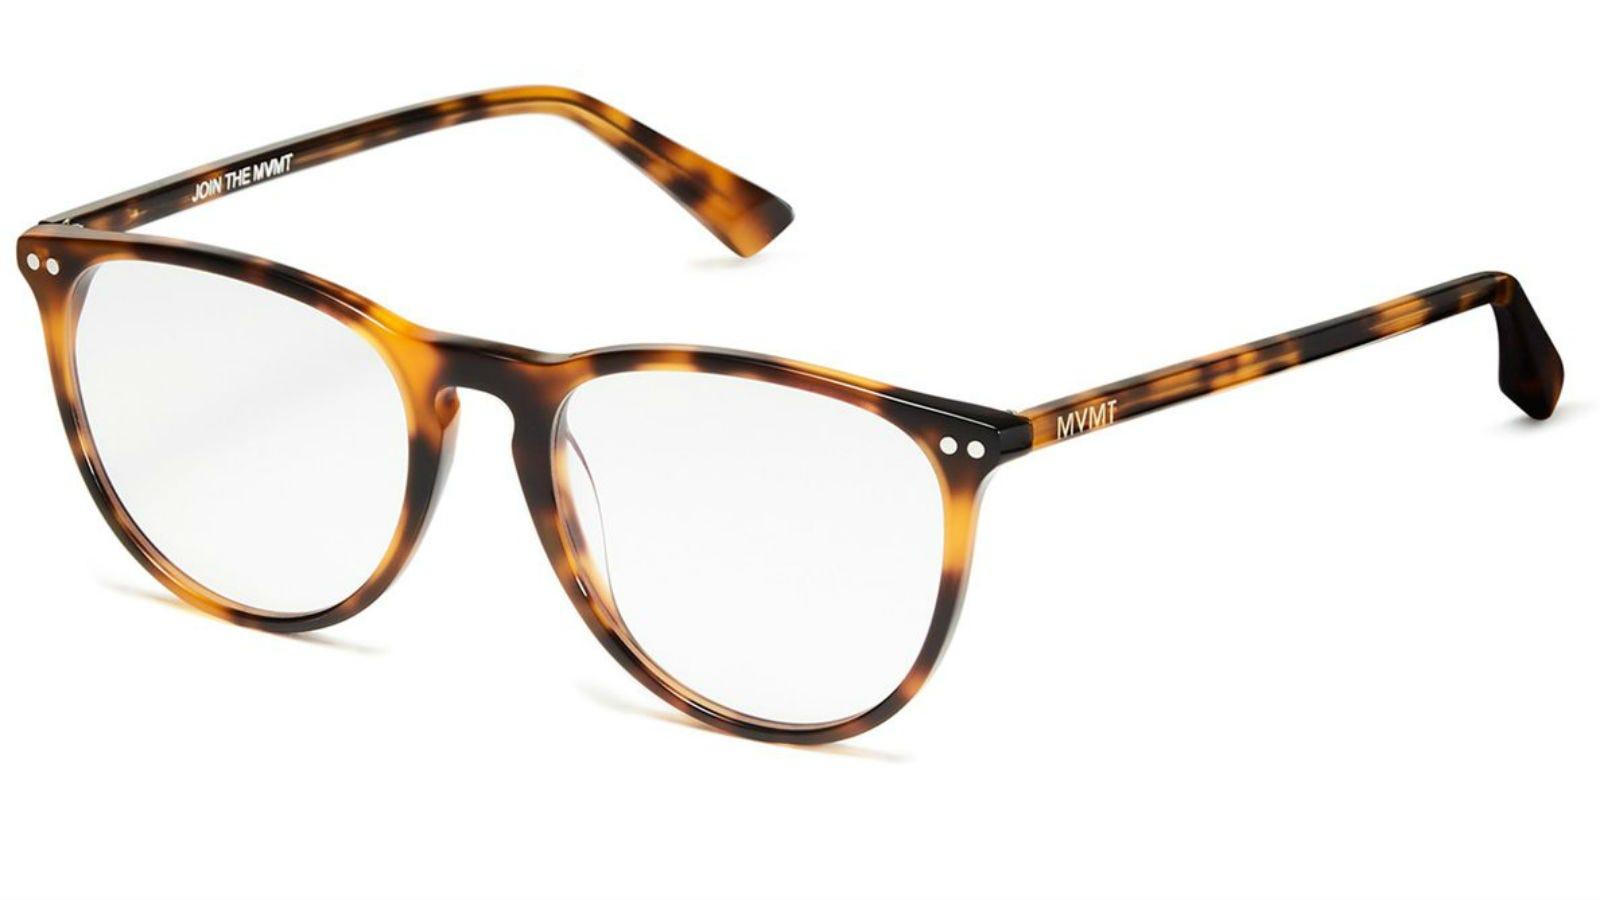 MVMT Ingram Everscroll Computer Glasses